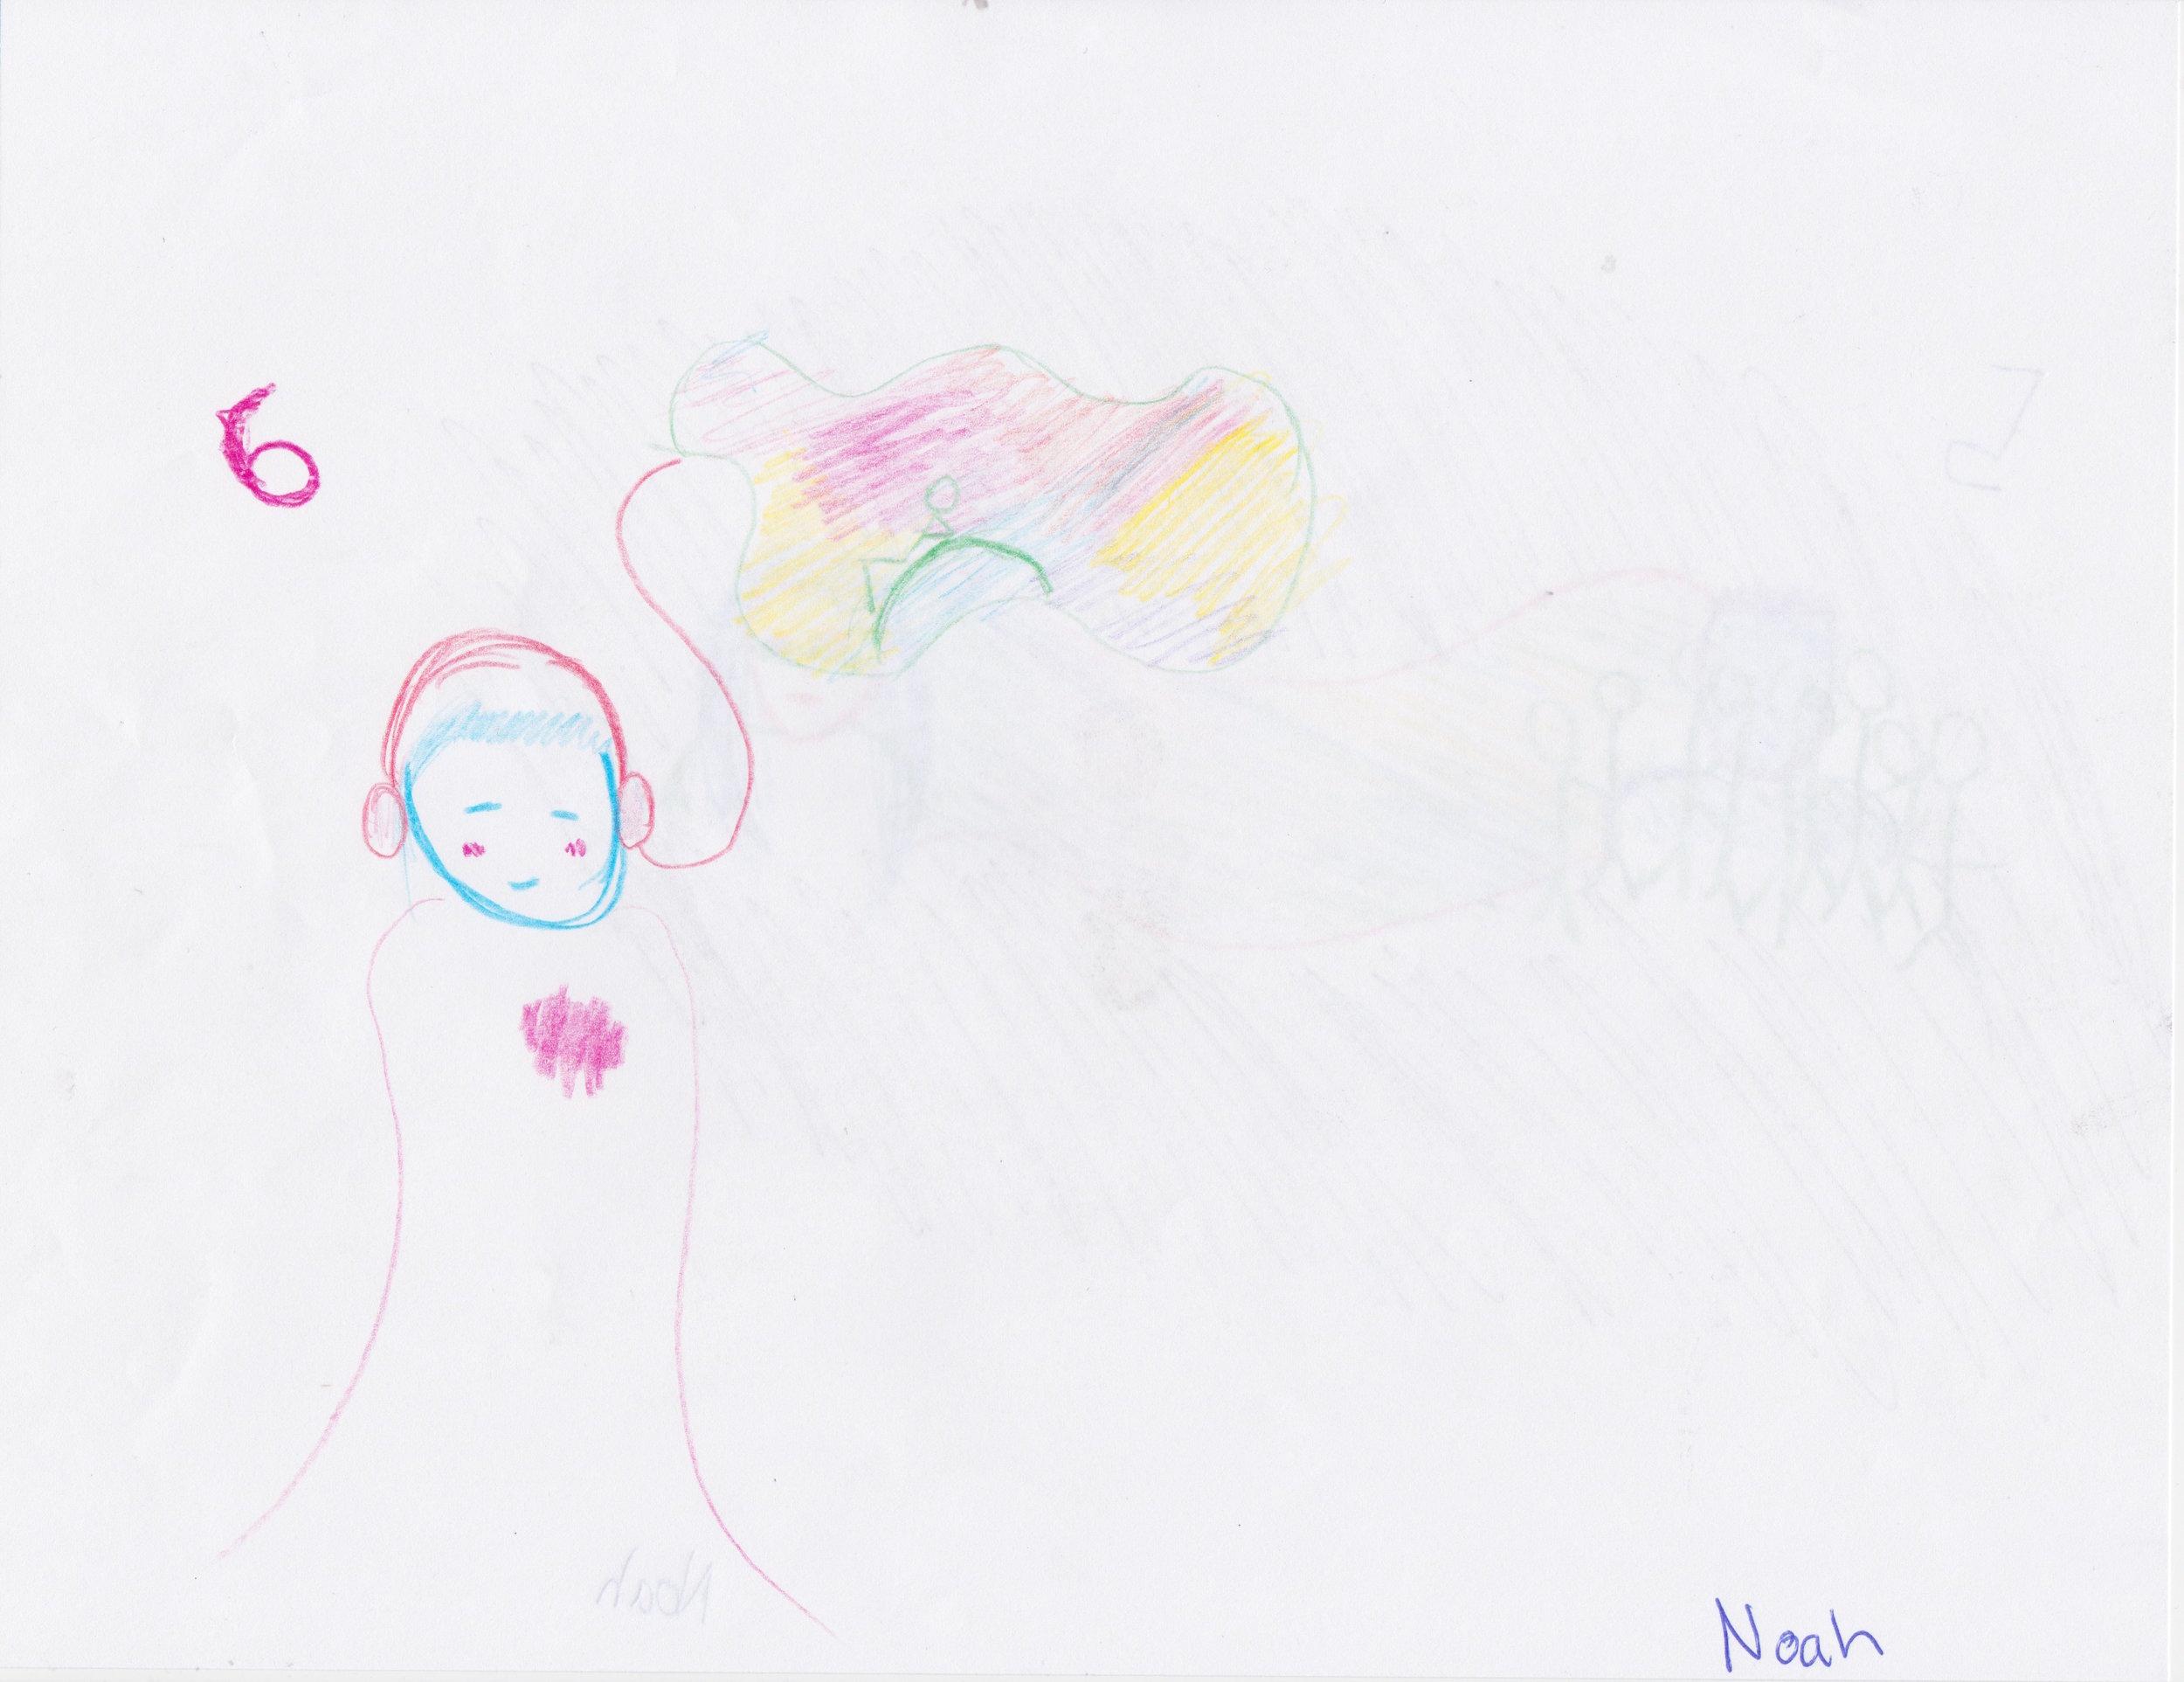 Illustrations by Noah Schifrin, Bassist